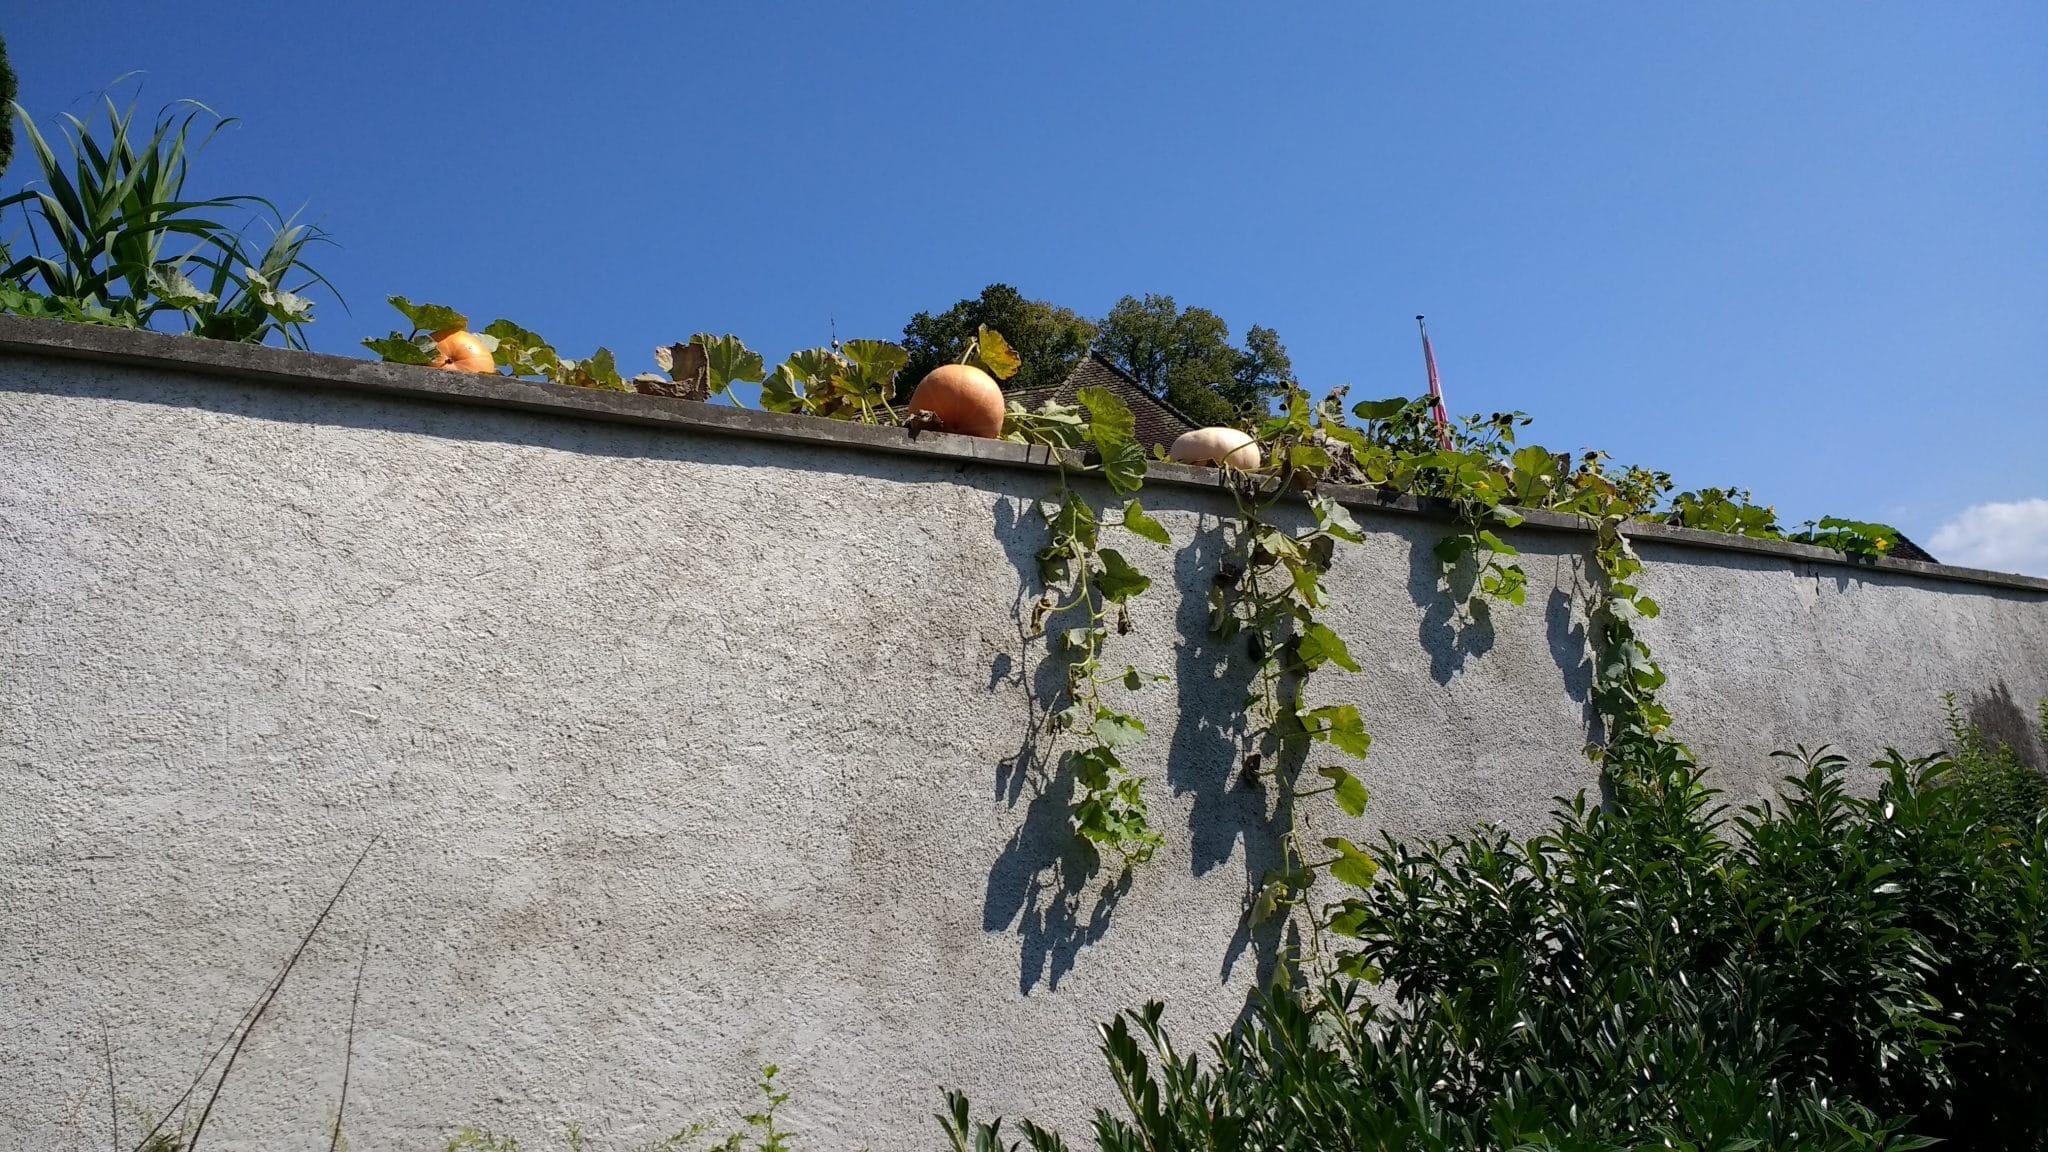 kasveja kaupunkiympäristössä